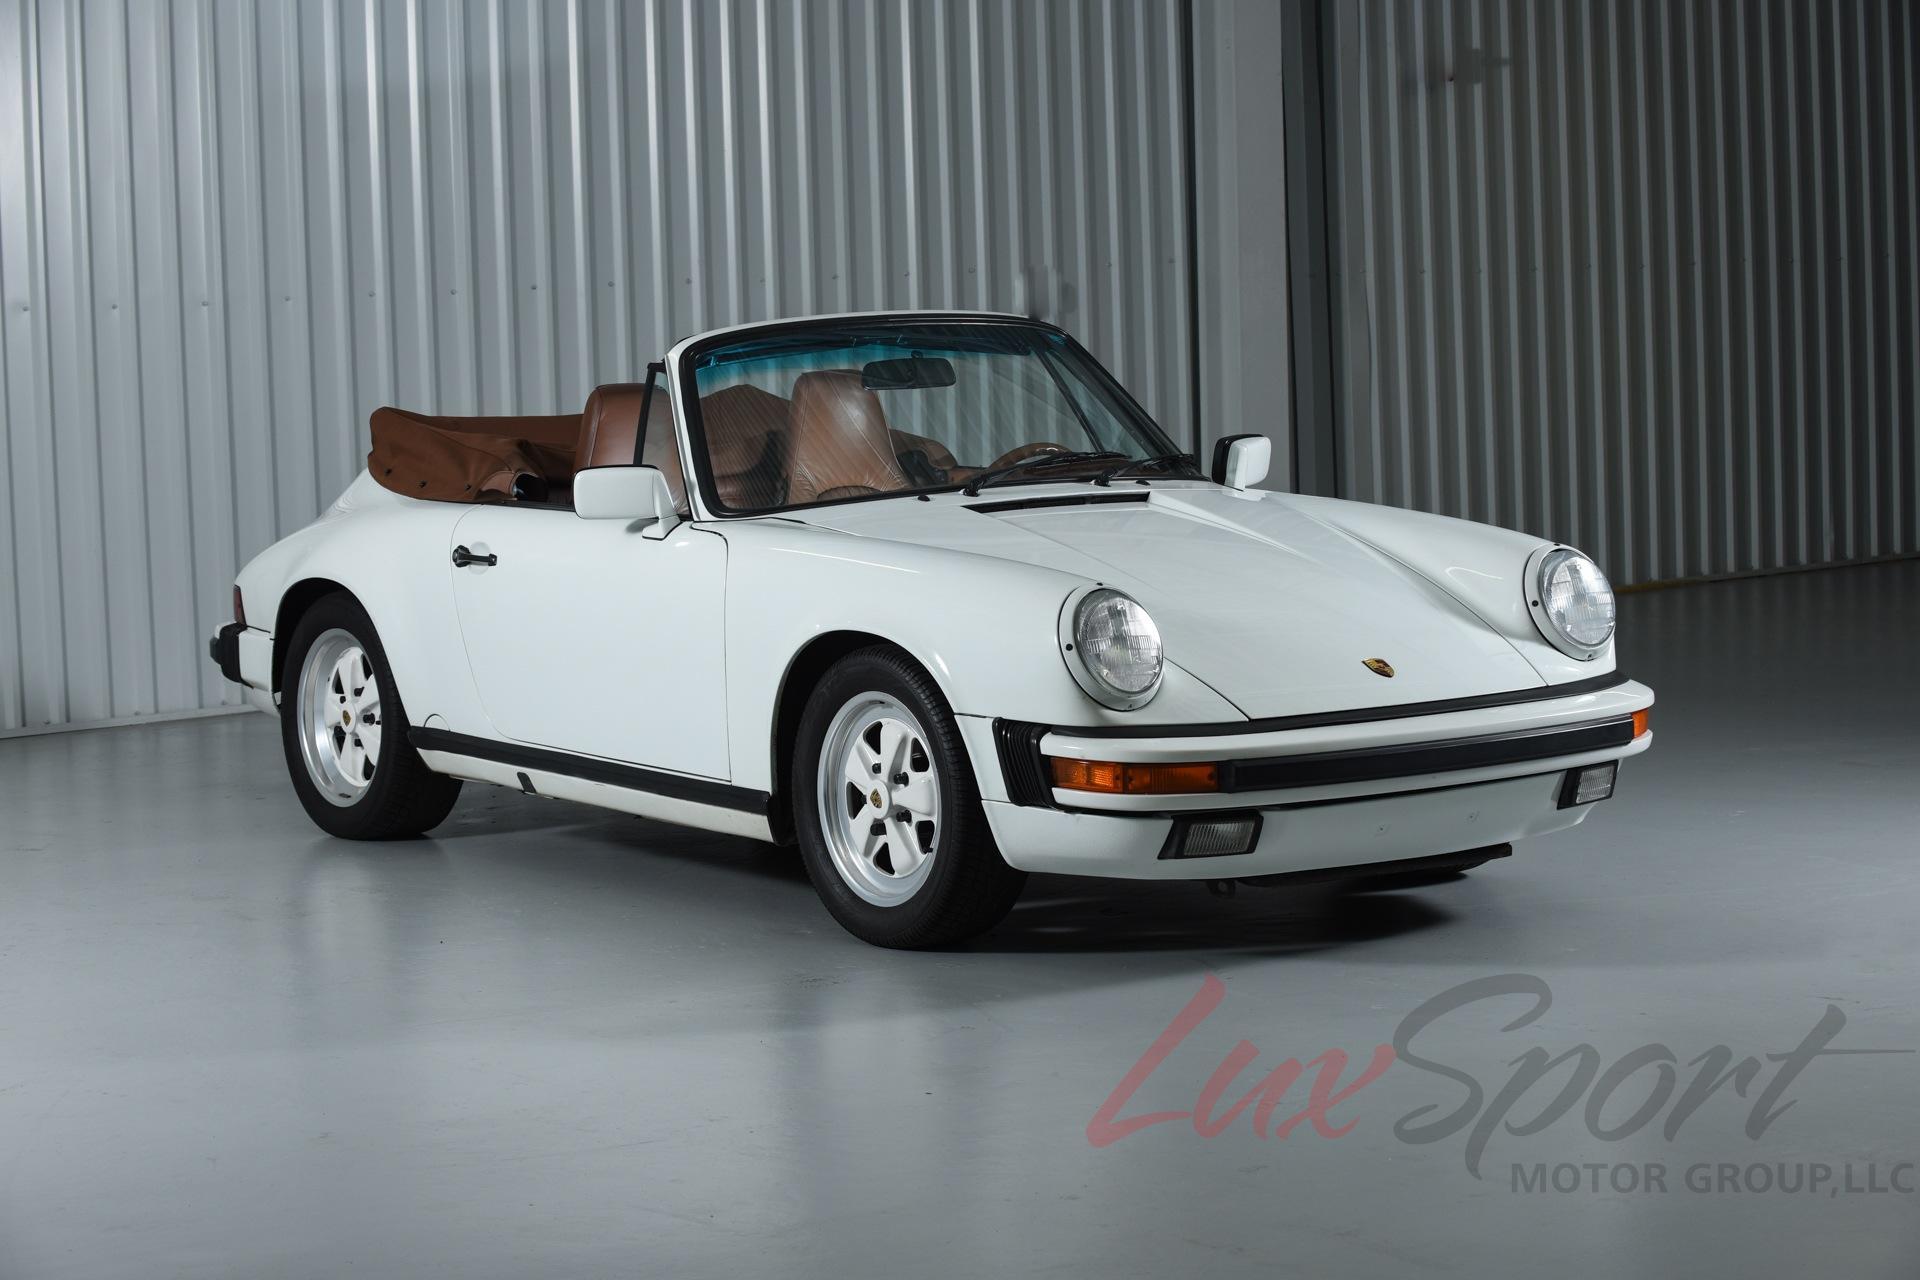 1988 porsche 911 carrera cabriolet carrera stock 1988130a for sale near new hyde park ny ny. Black Bedroom Furniture Sets. Home Design Ideas